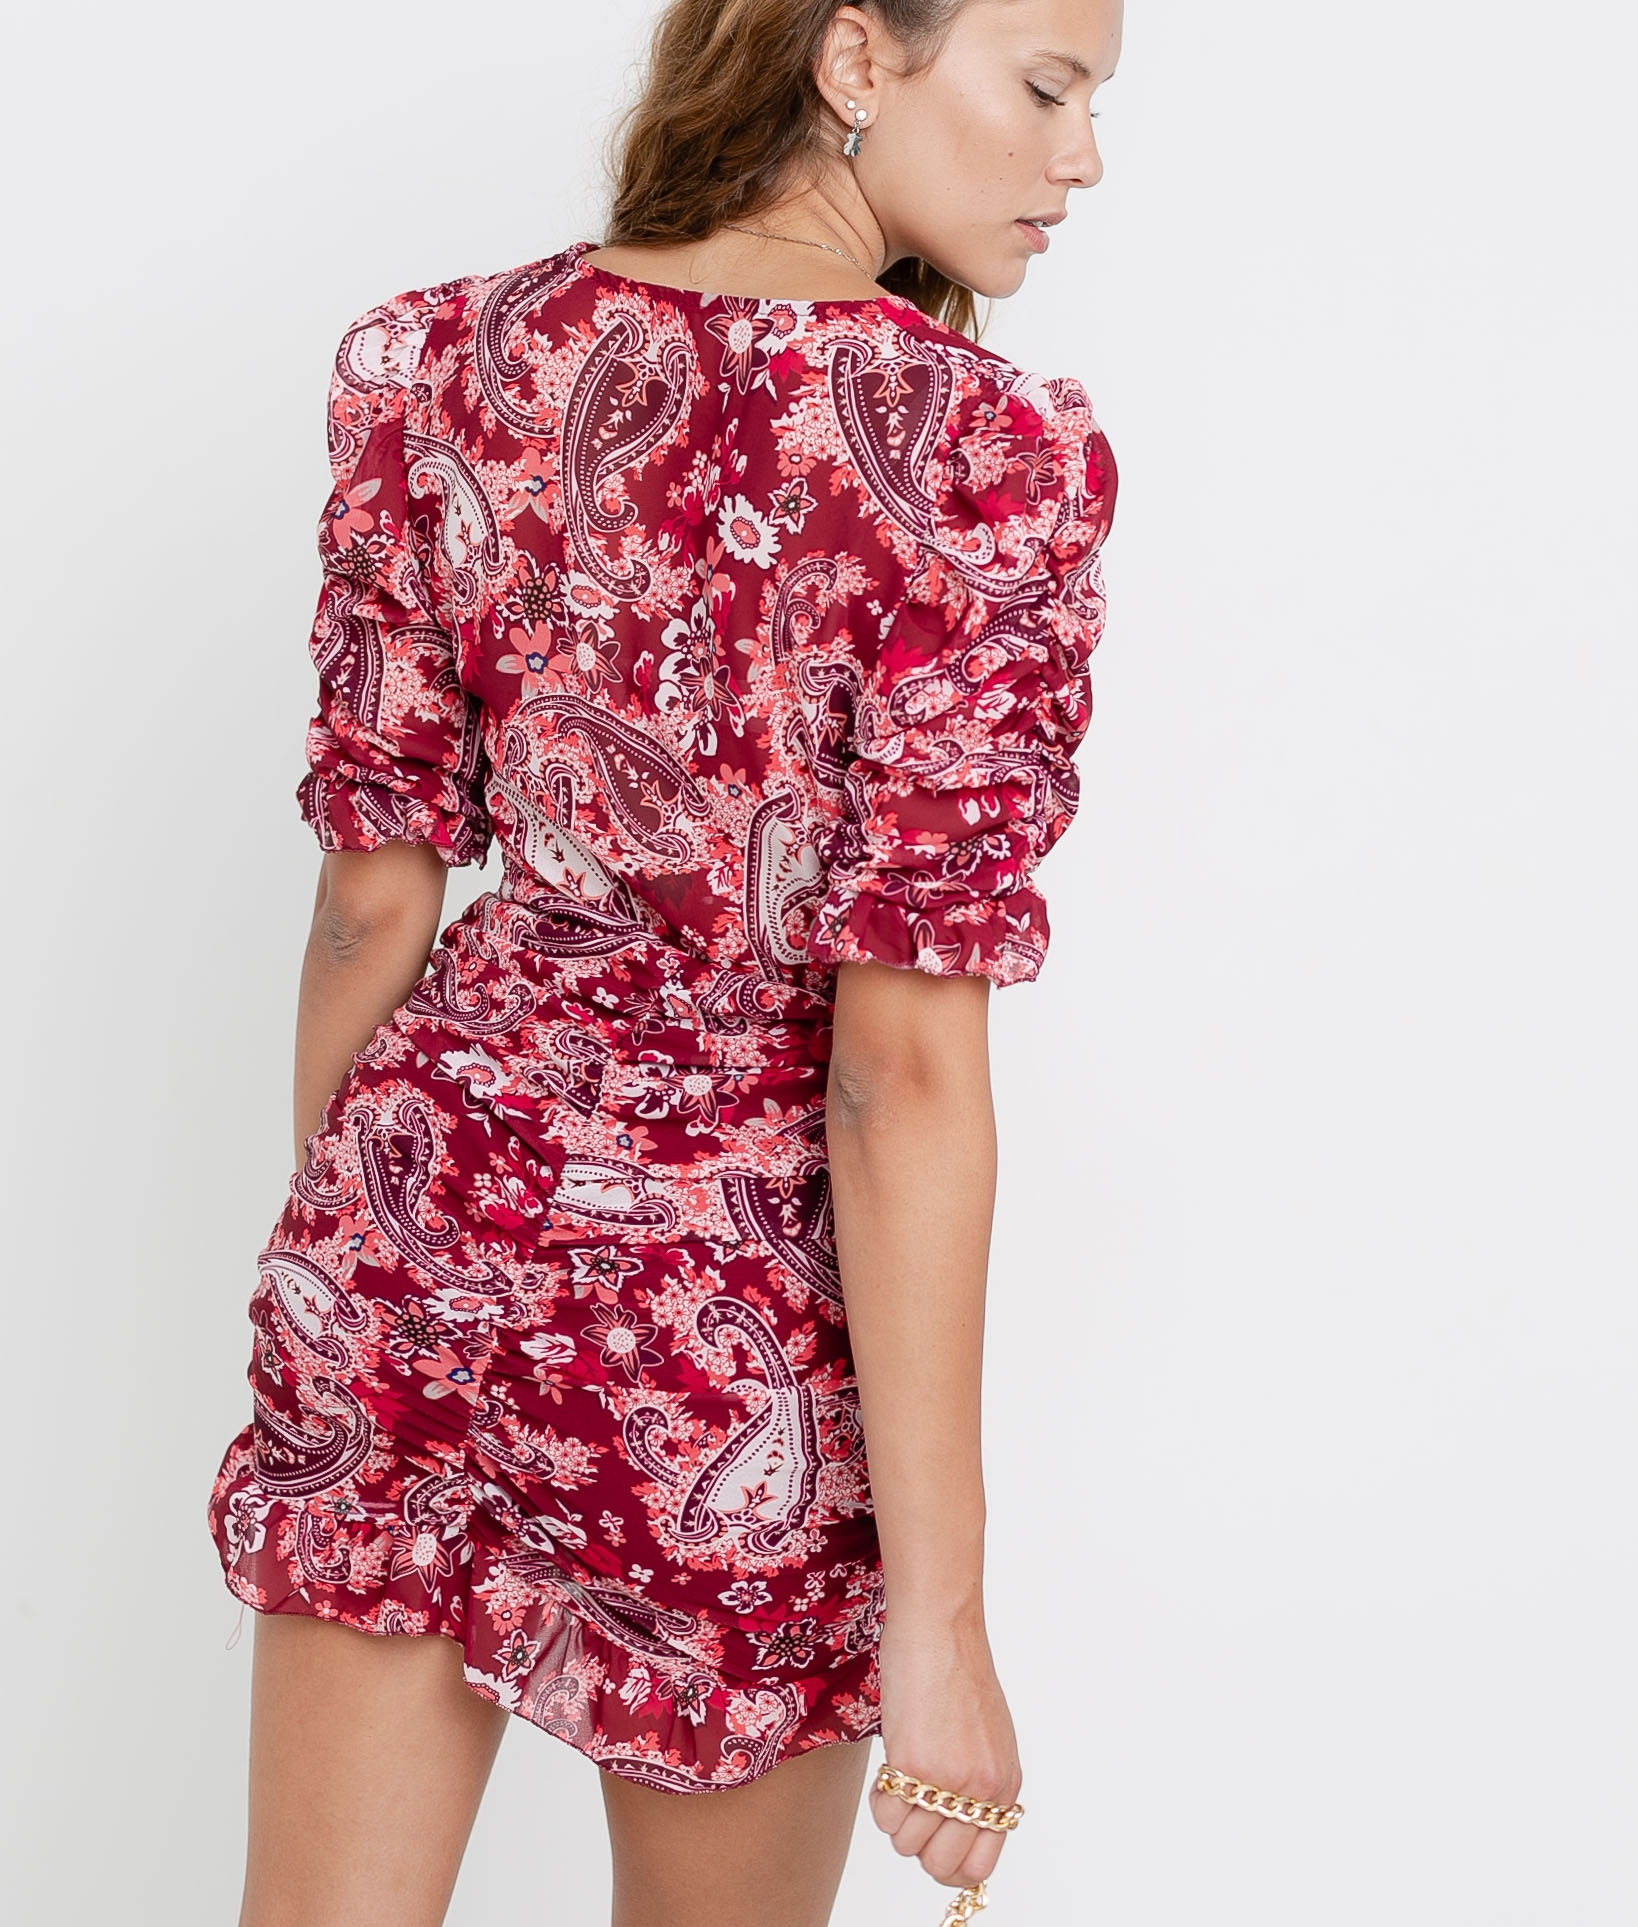 Vestido Lavoe - Rojo/Granate